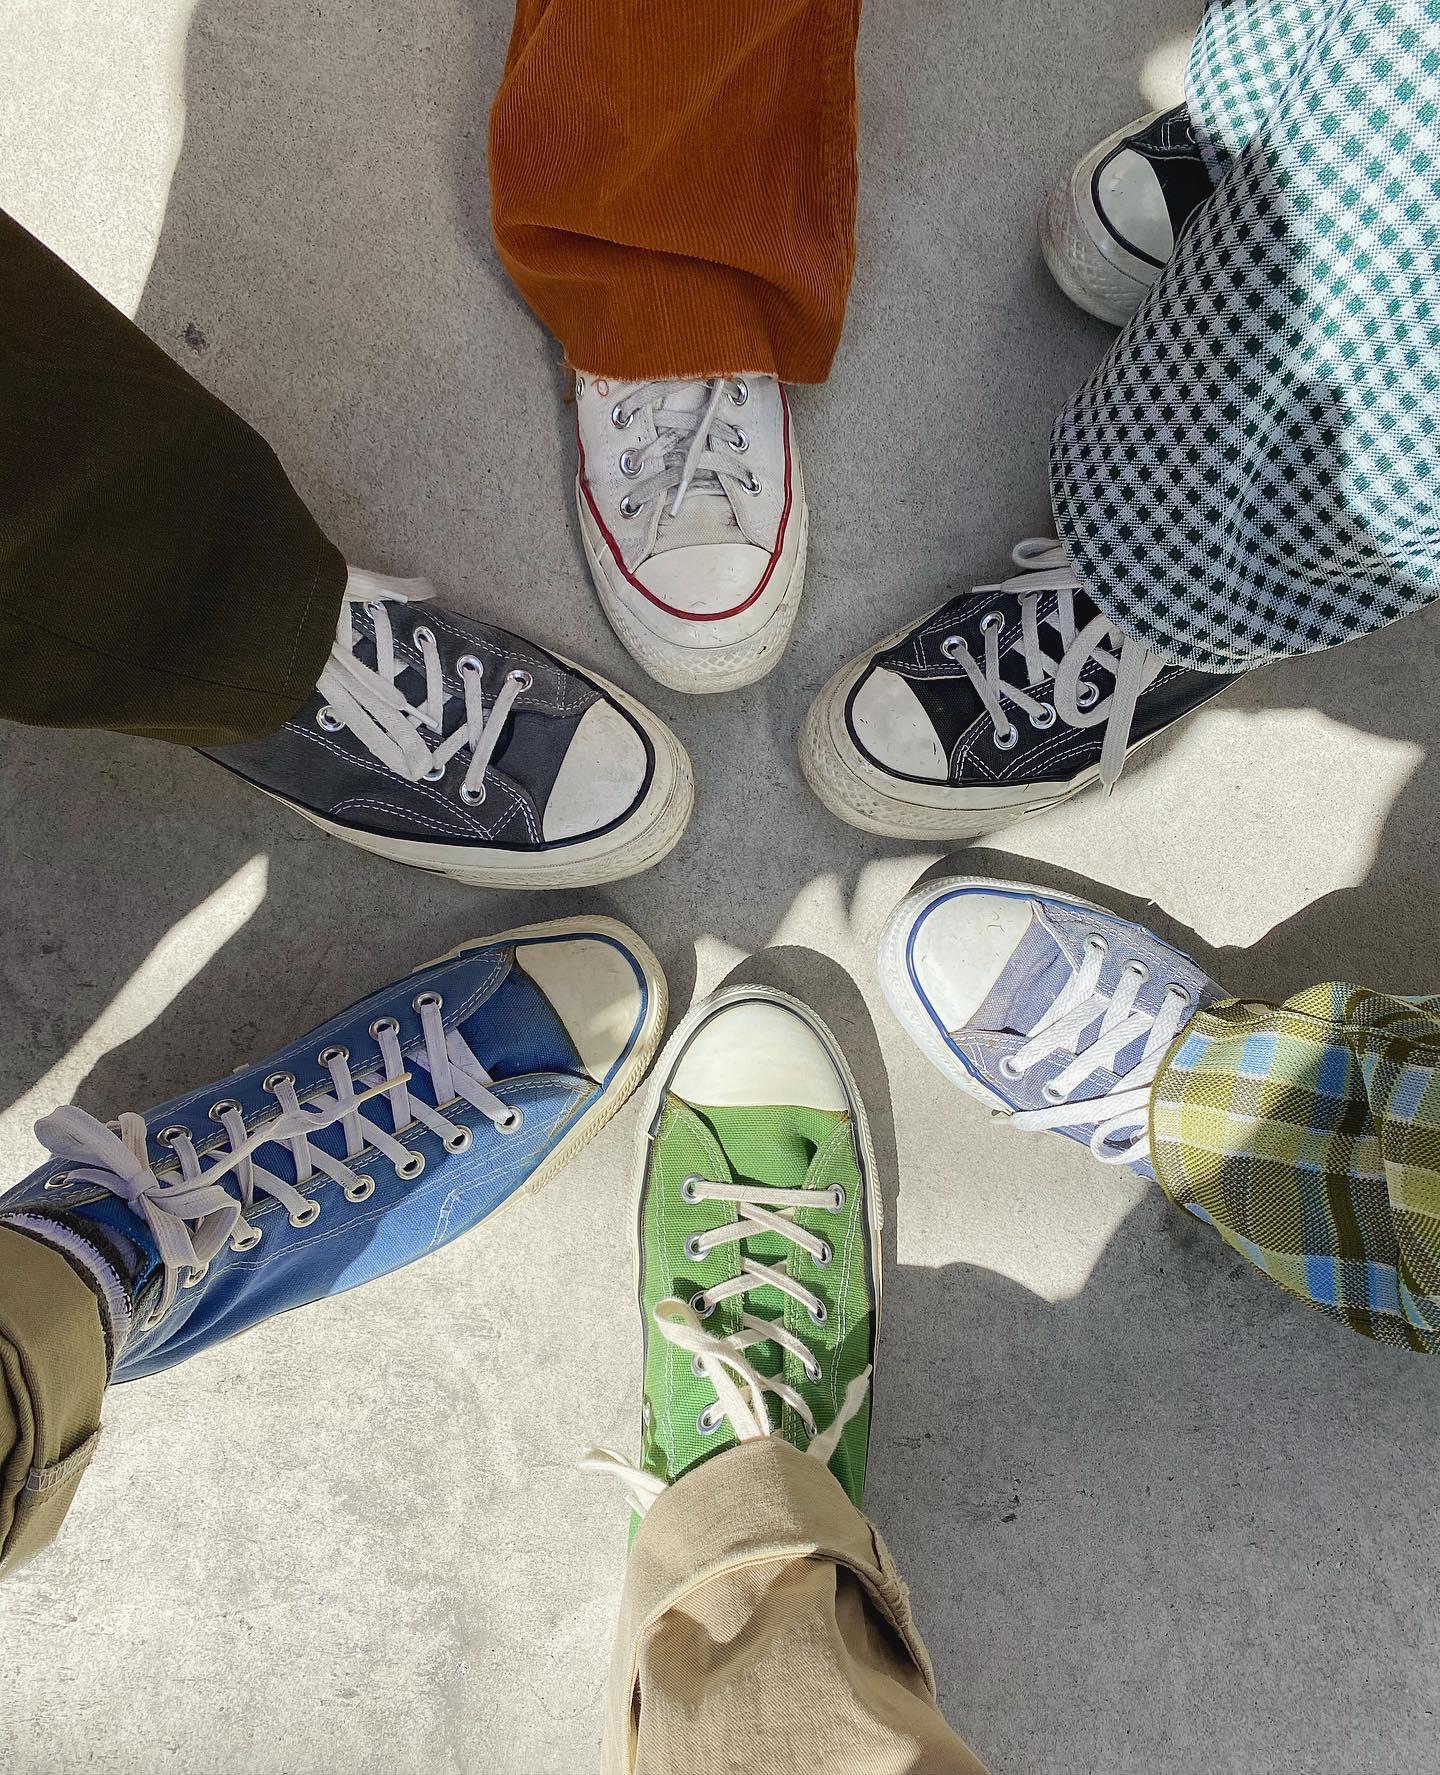 staff converse day!!.#converse#chucktaylor#usa#70s#80s#90s#vintage#hearty#abond#群馬美容室#高崎美容室#美容室#fashion#ootd#sneakers